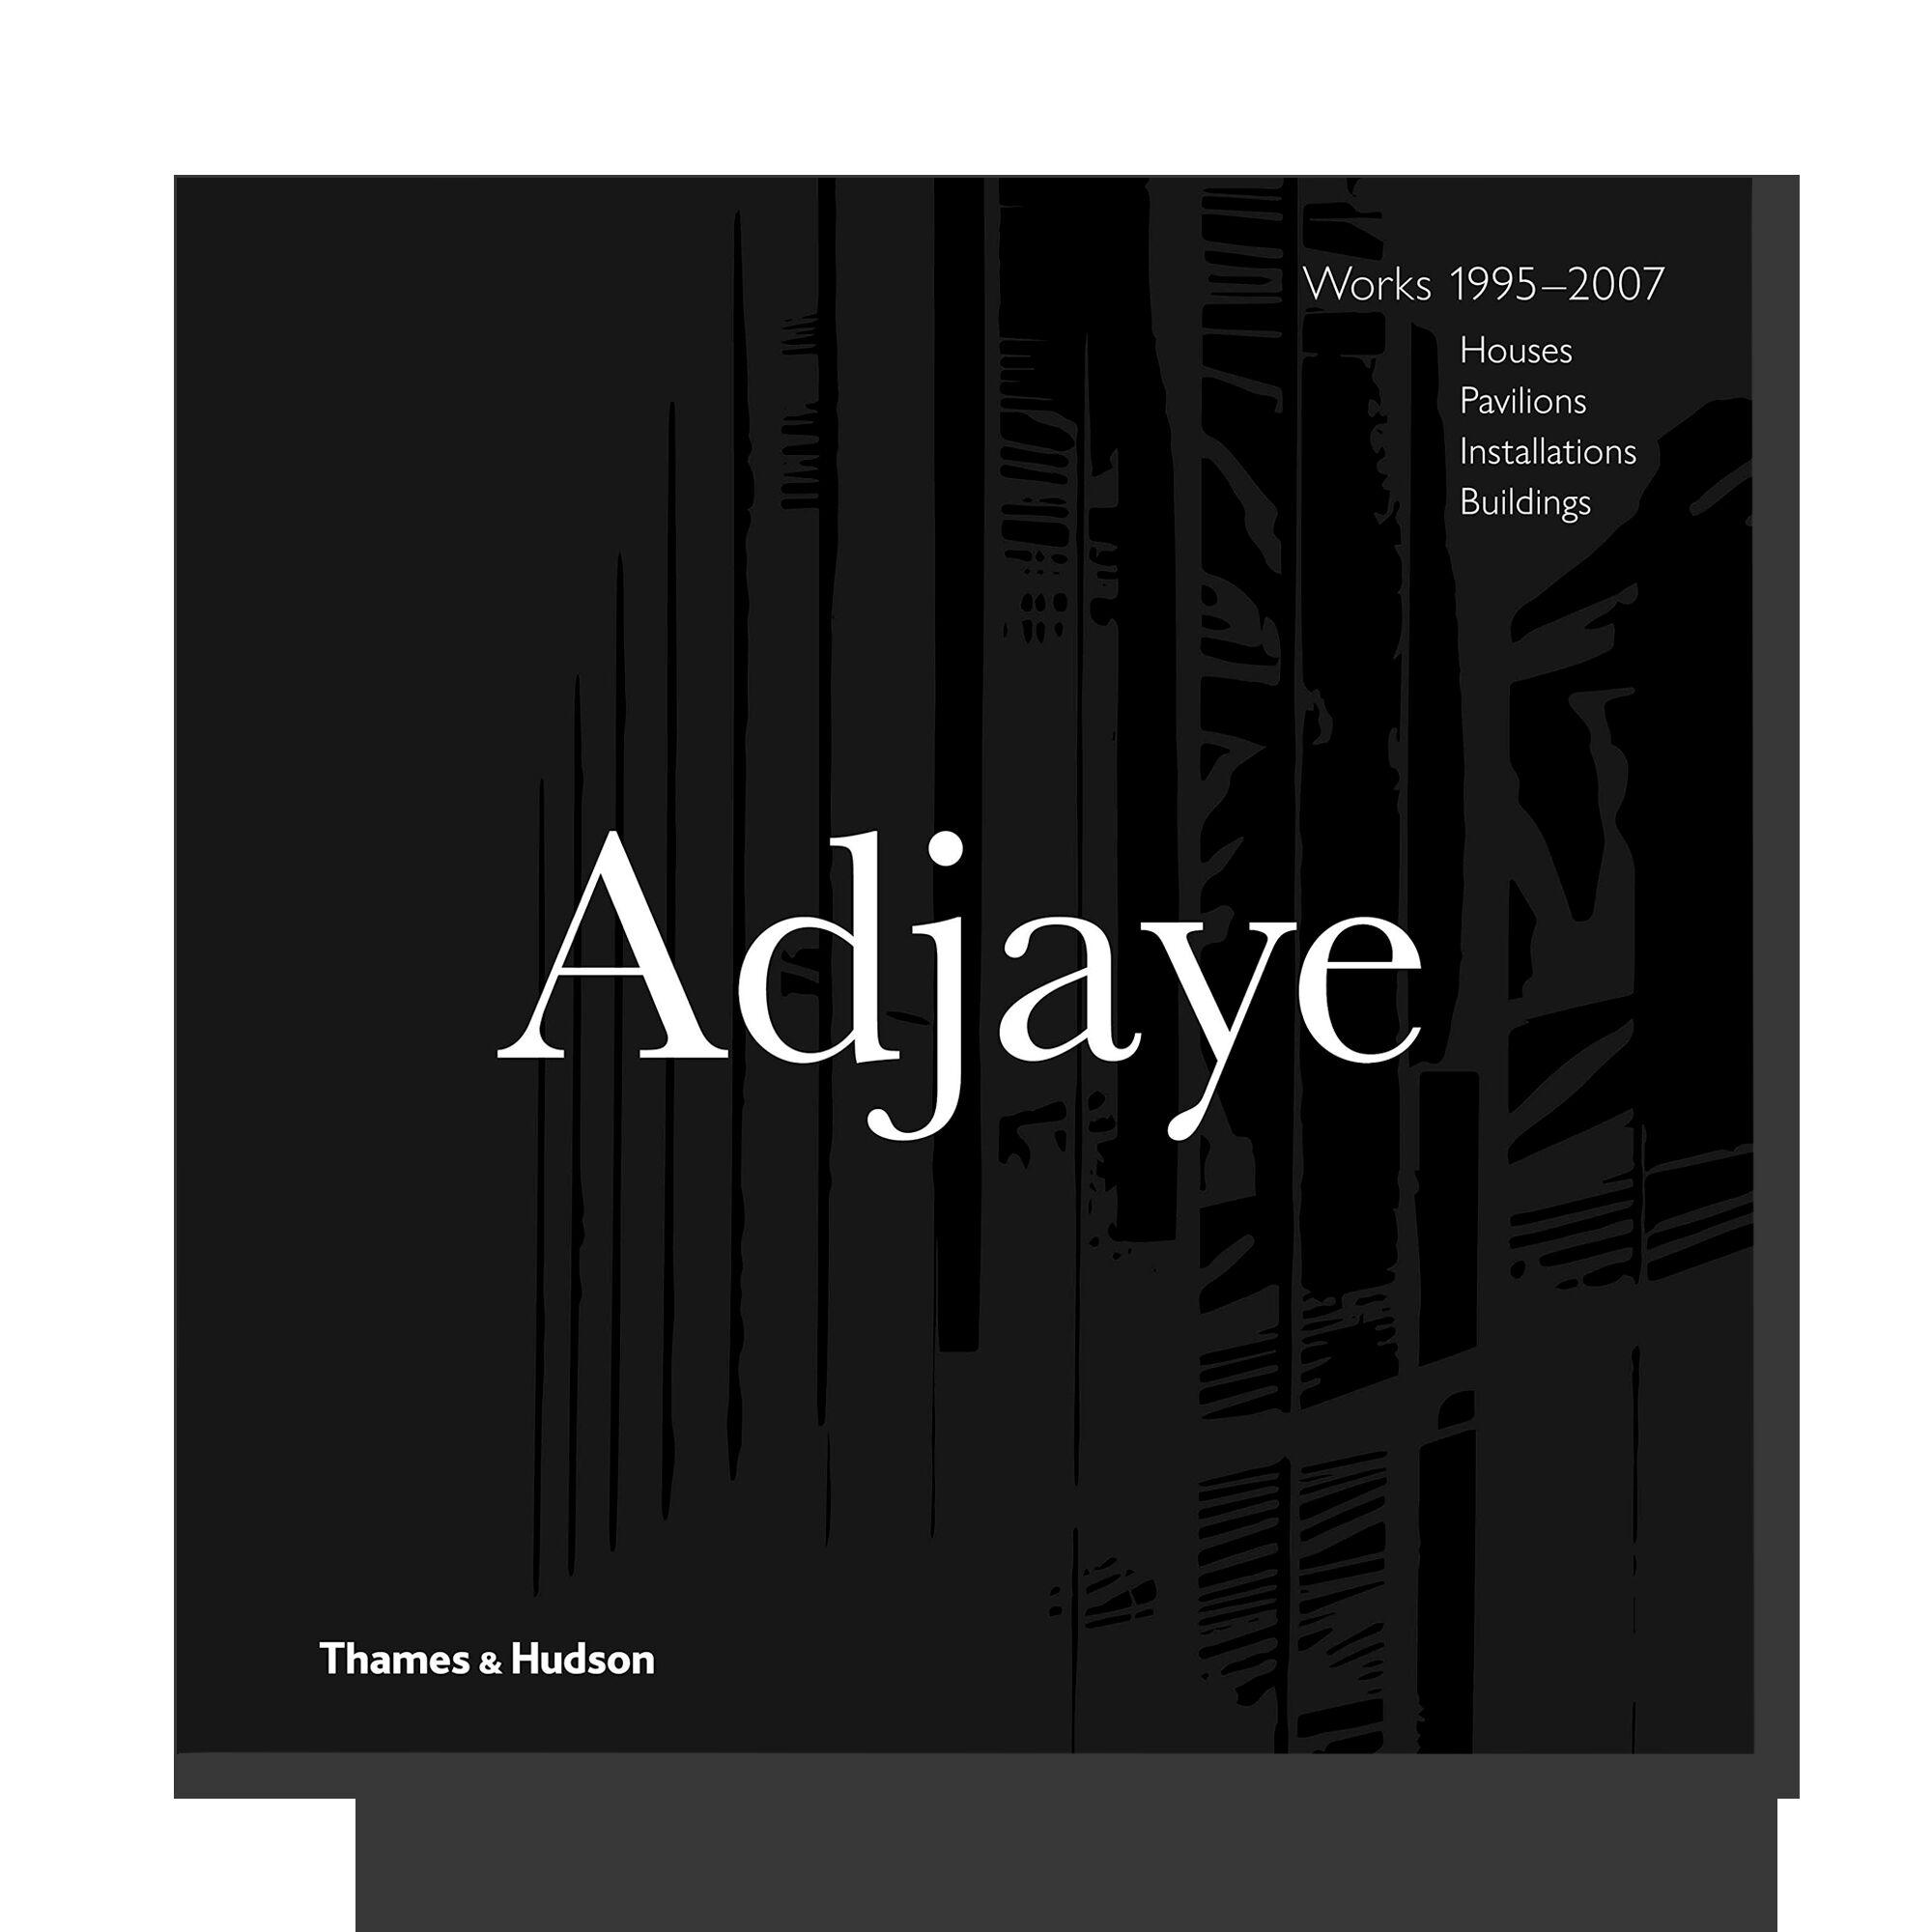 Adjaye - Works: Houses, Pavilions, Installations, Buildings, 1995-2007